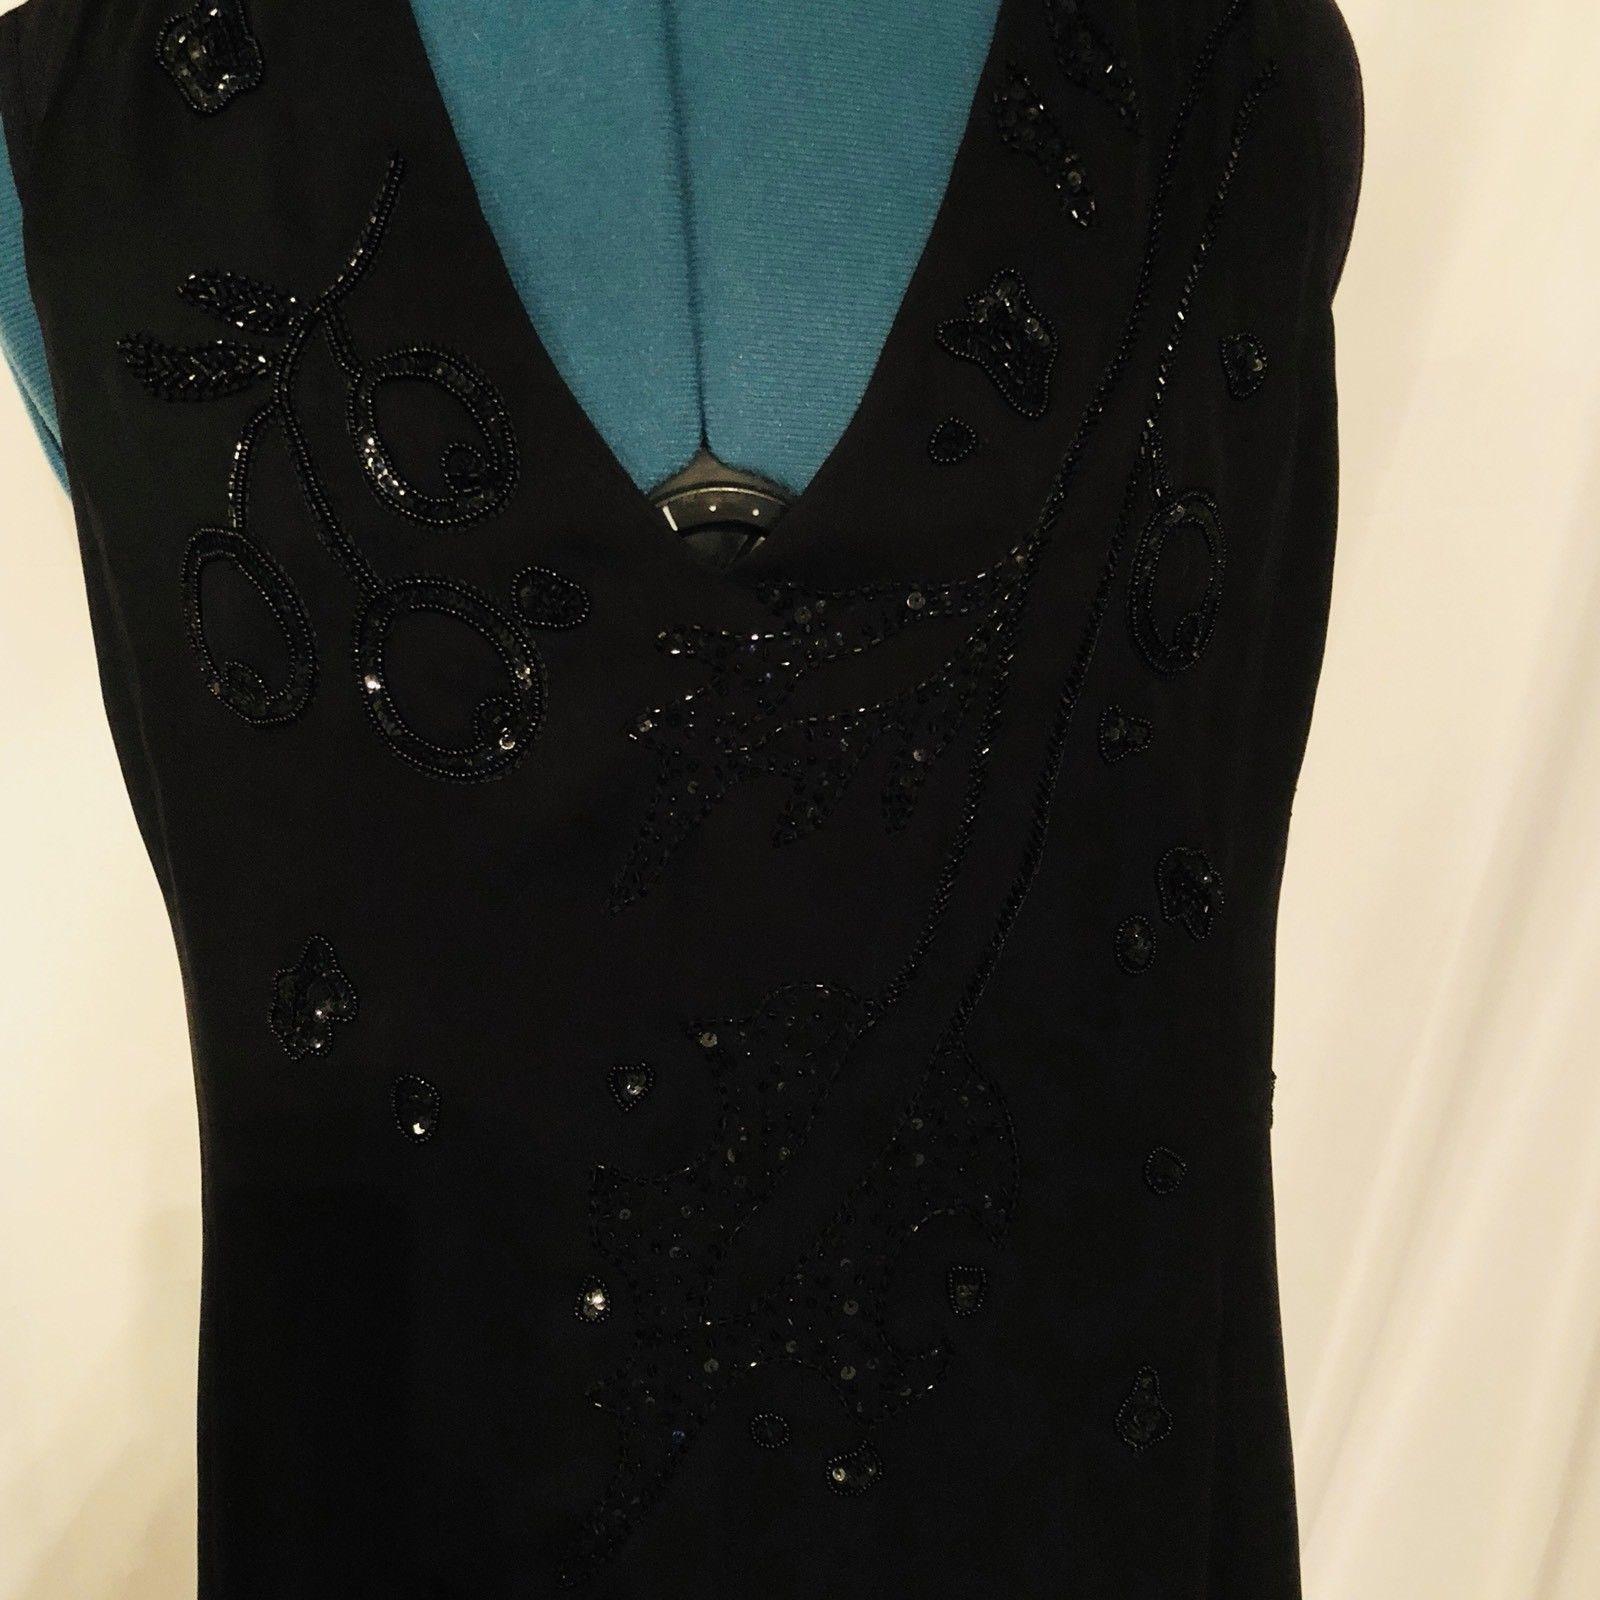 Armani Collezioni Black Halter Lined Dress Size 10 EU 46 Prom Evening image 3